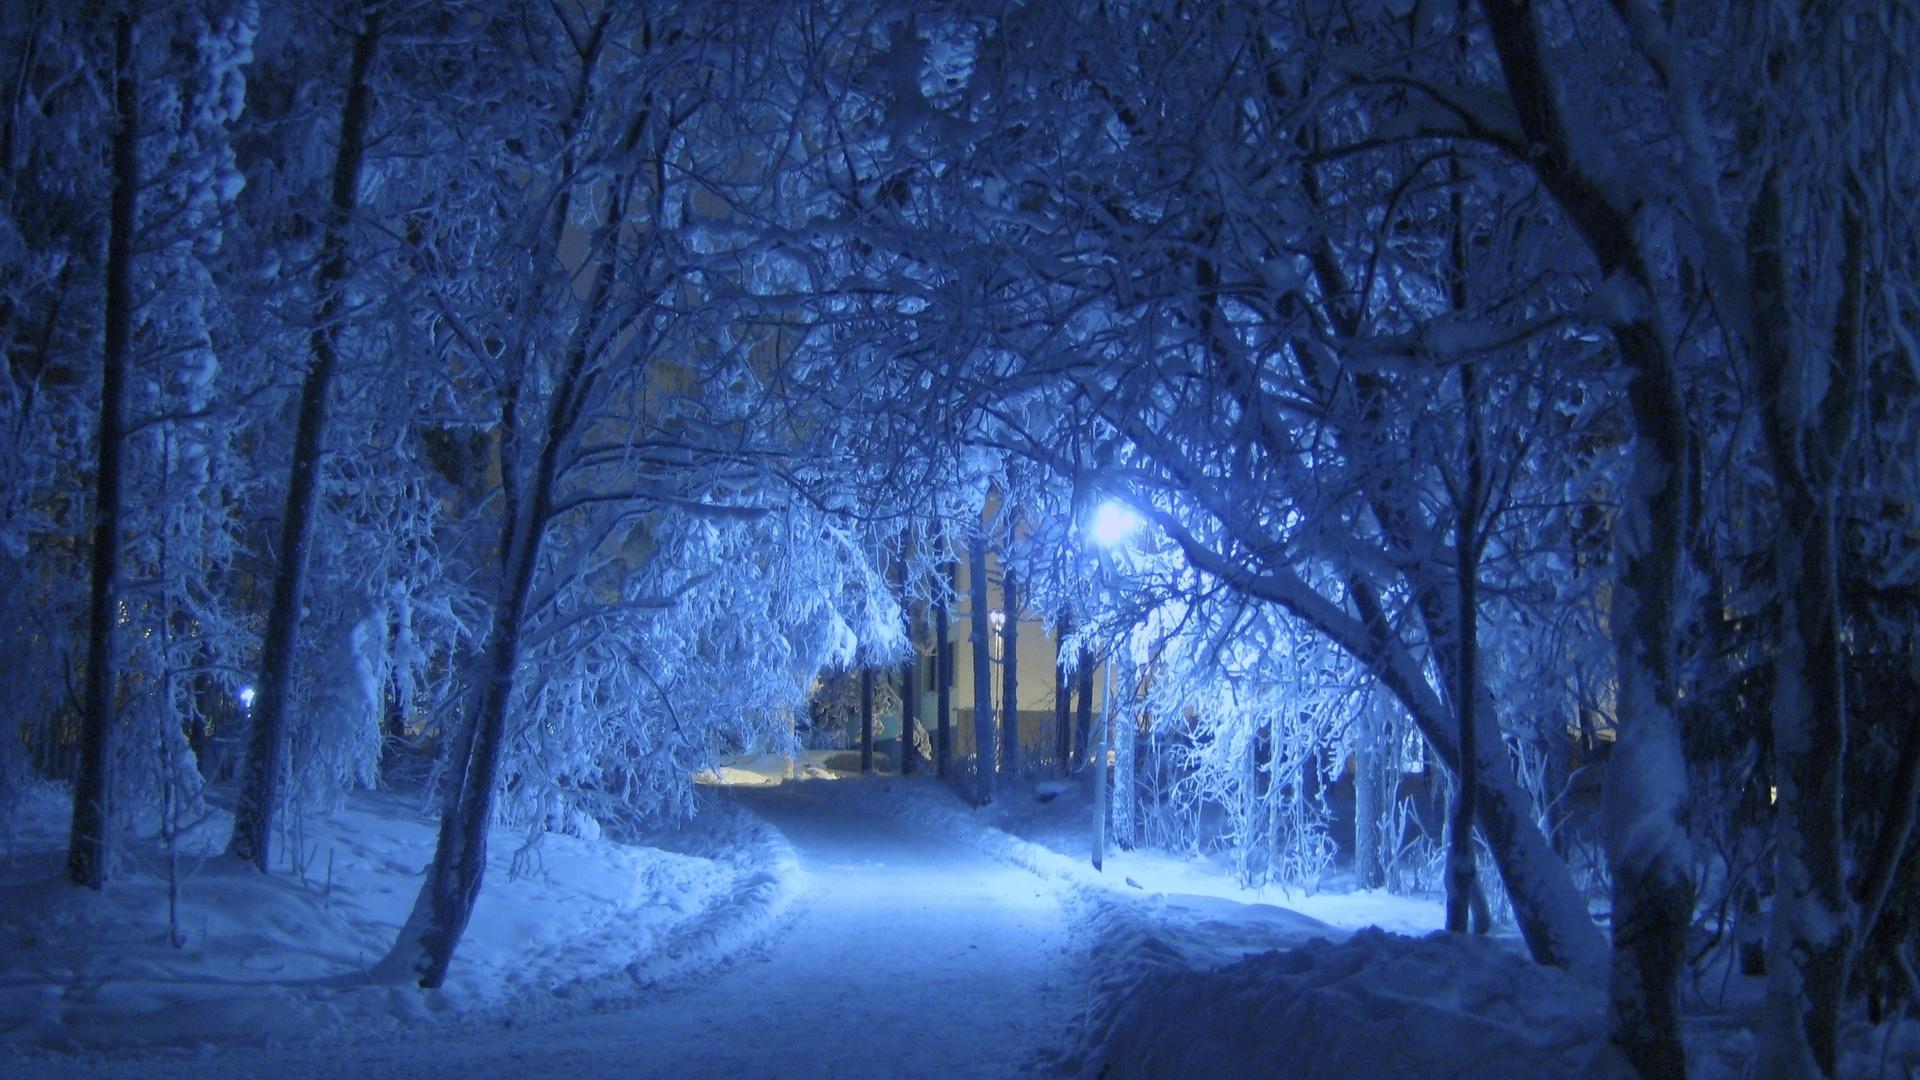 парк, дорожка, огни, ночь, зима